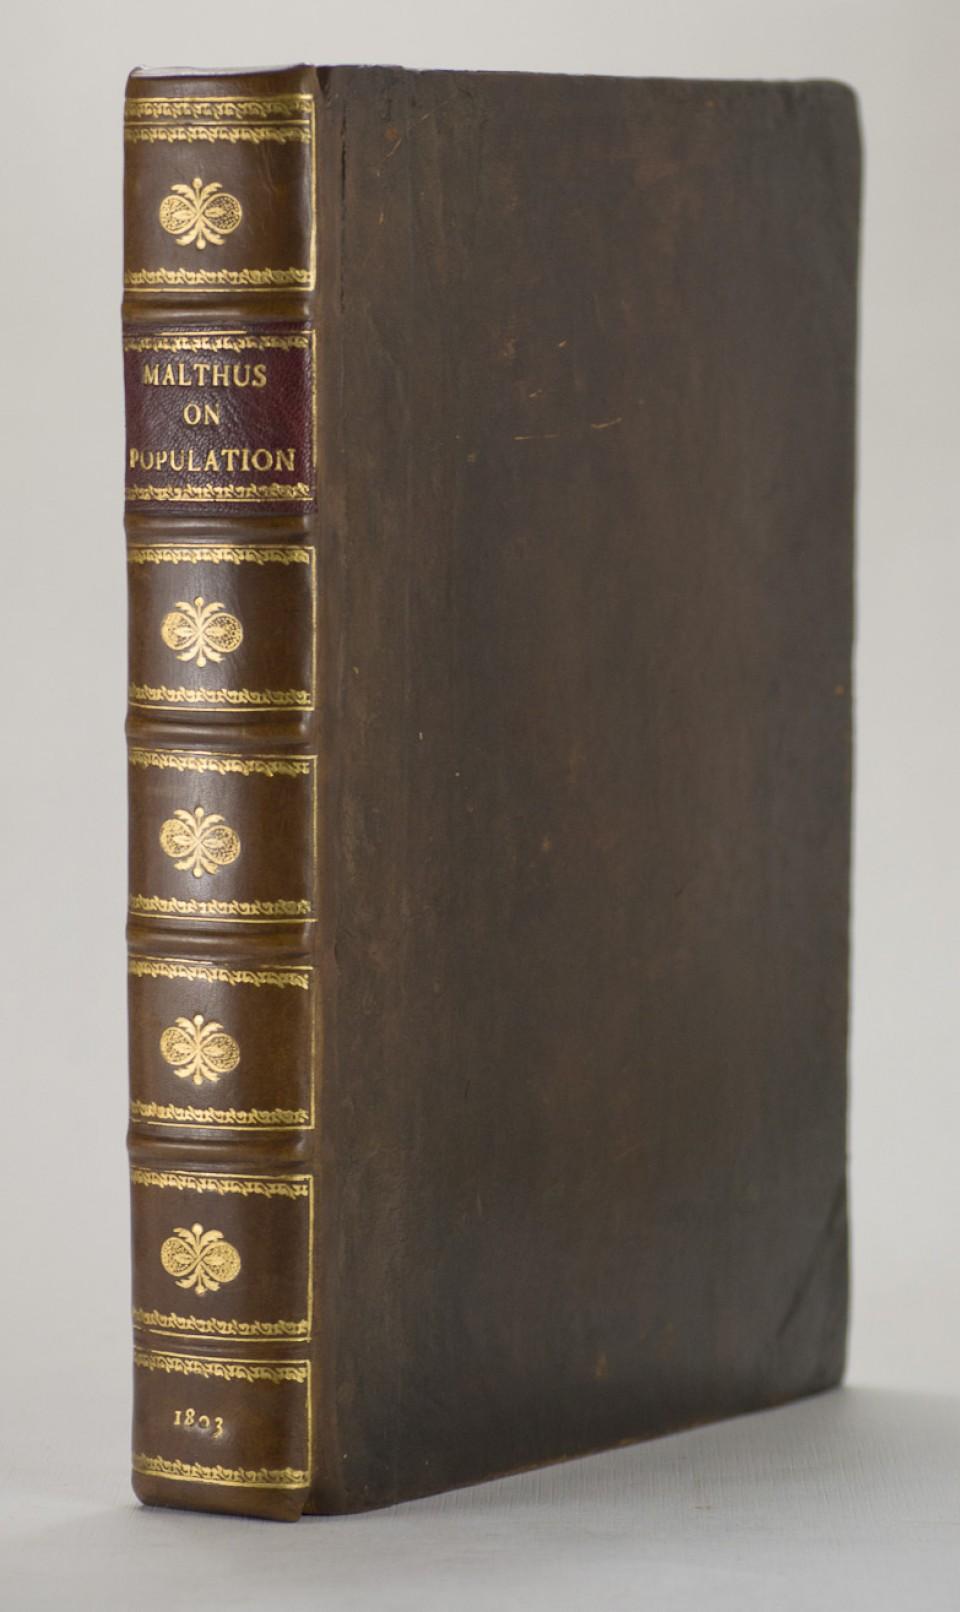 020 65276 1 Essay Example On The Principle Of Singular Population Malthus Sparknotes Thomas Main Idea 960